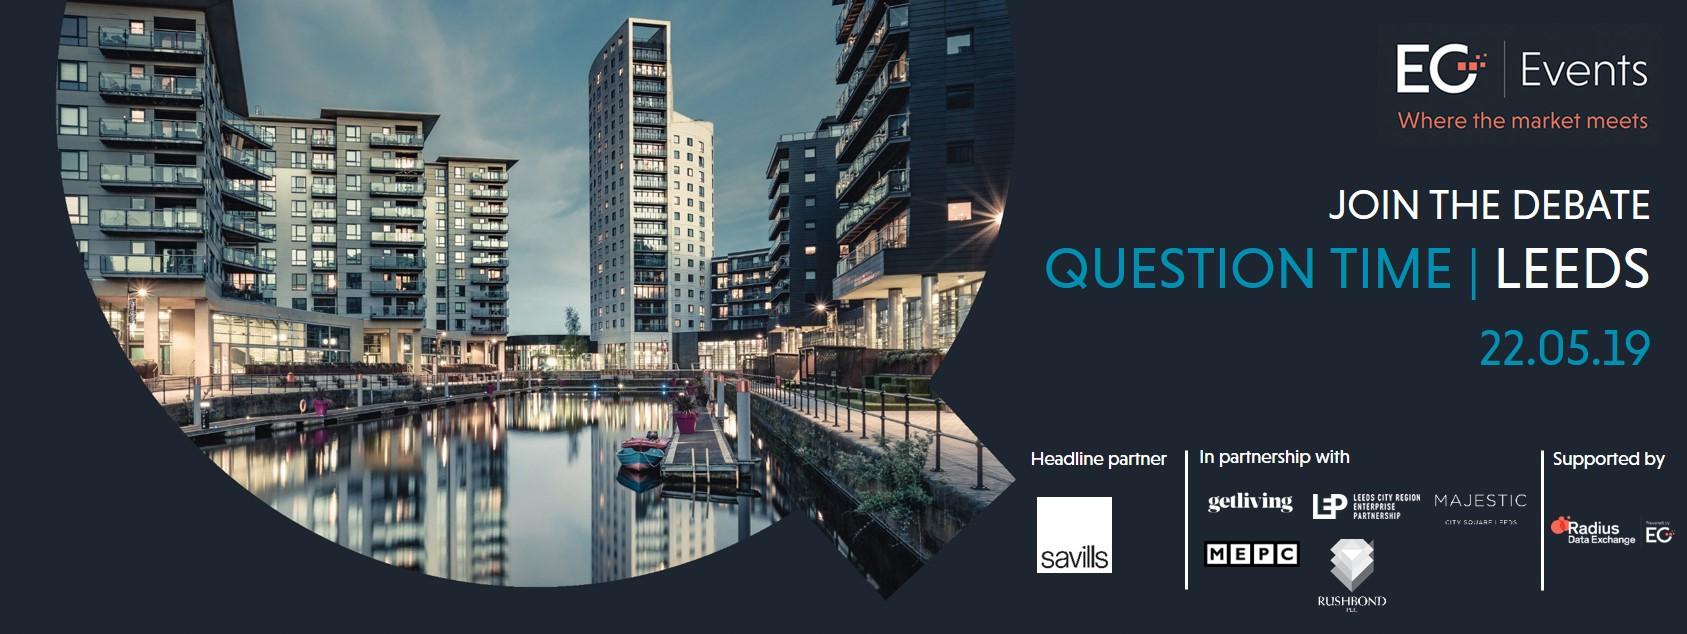 EG Question Time Leeds | 05.22.19